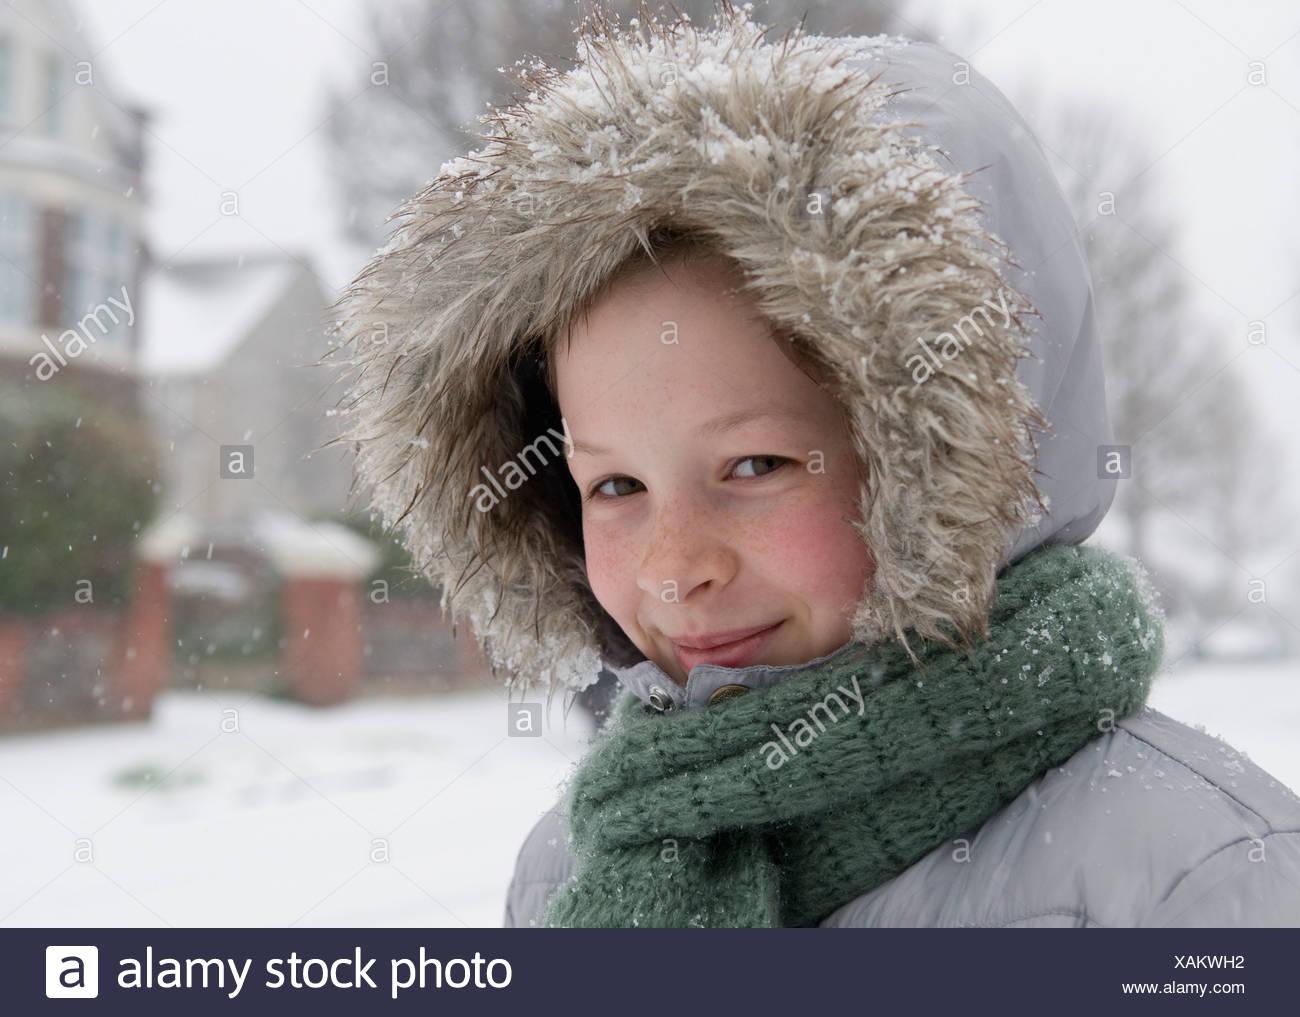 Boy wearing fur hood in snow - Stock Image